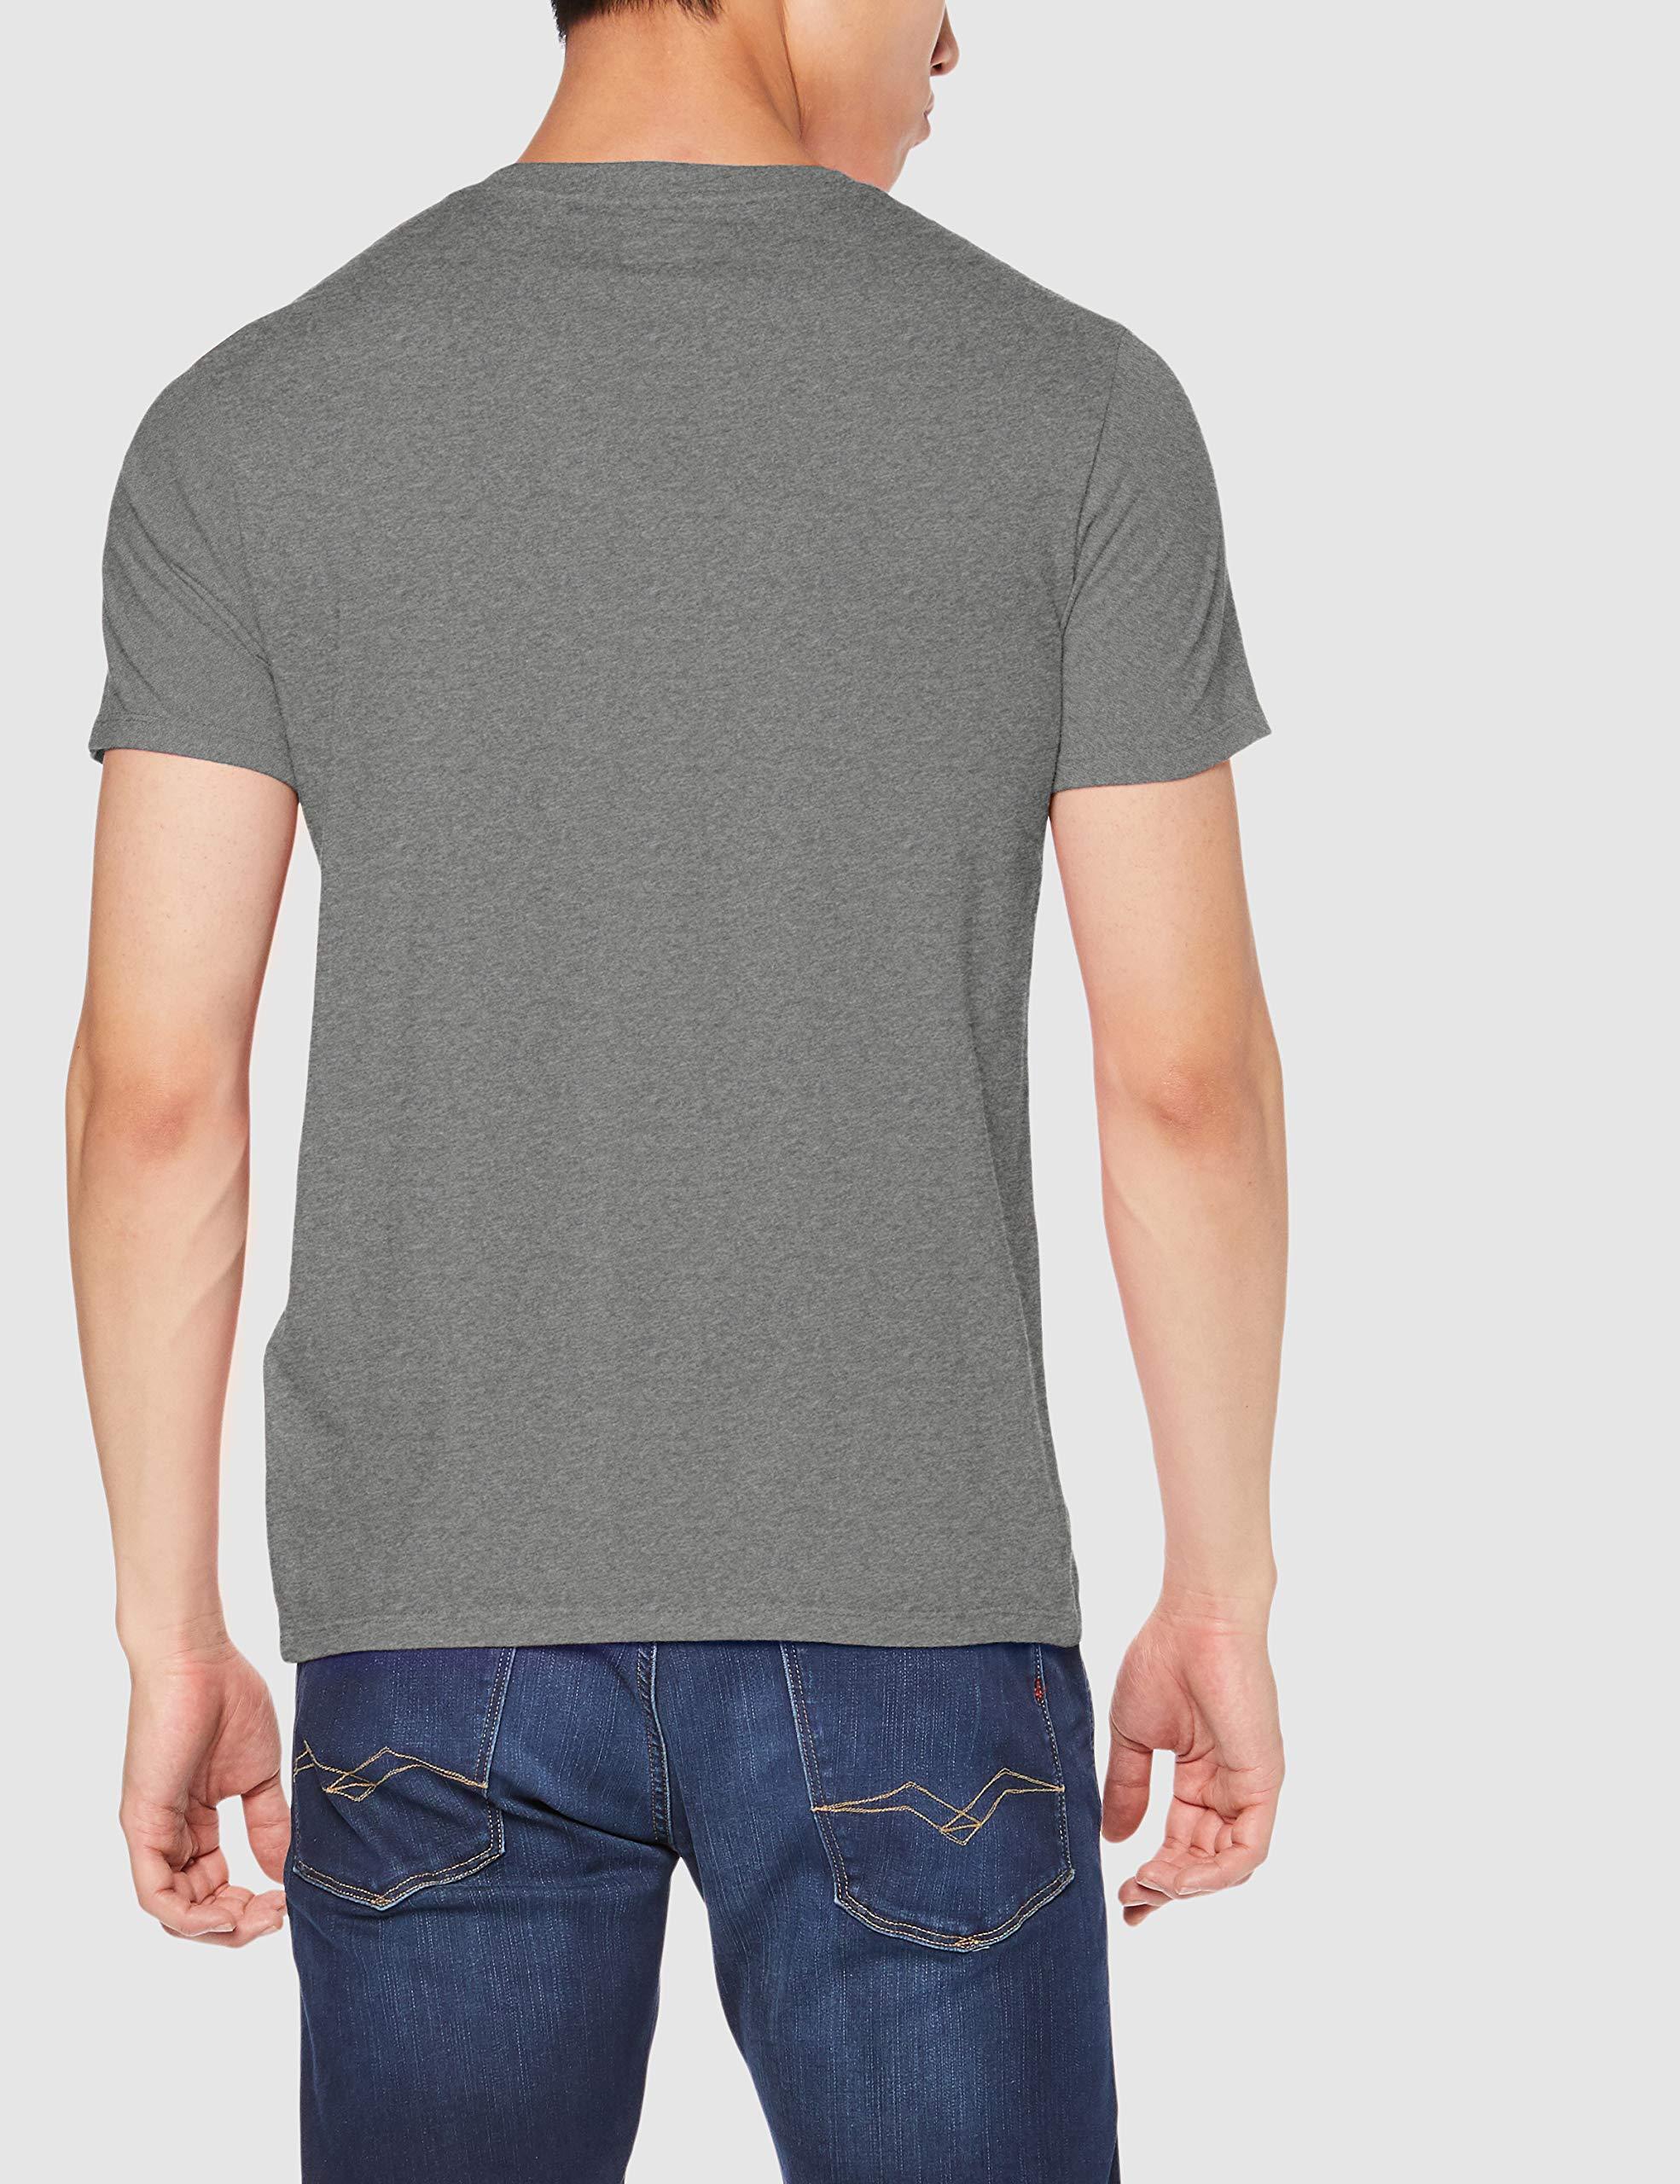 Levi's SS Original HM Tee T-Shirt Uomo 5 spesavip